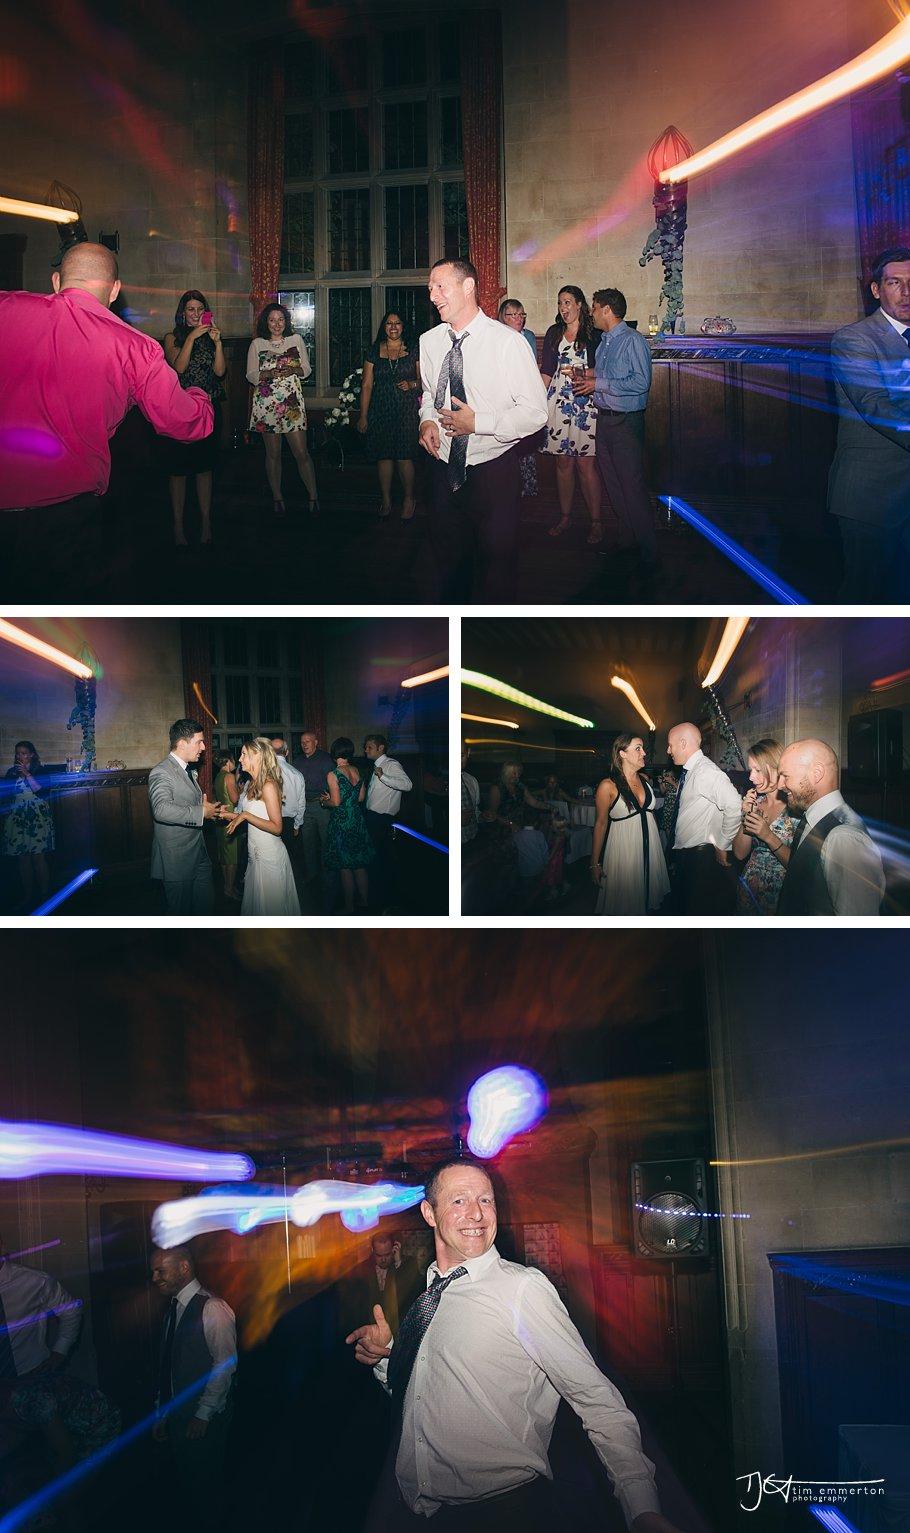 Wedding-Photographer-Fanhams-Hall-Hotel-Hertfordshire-183.jpg